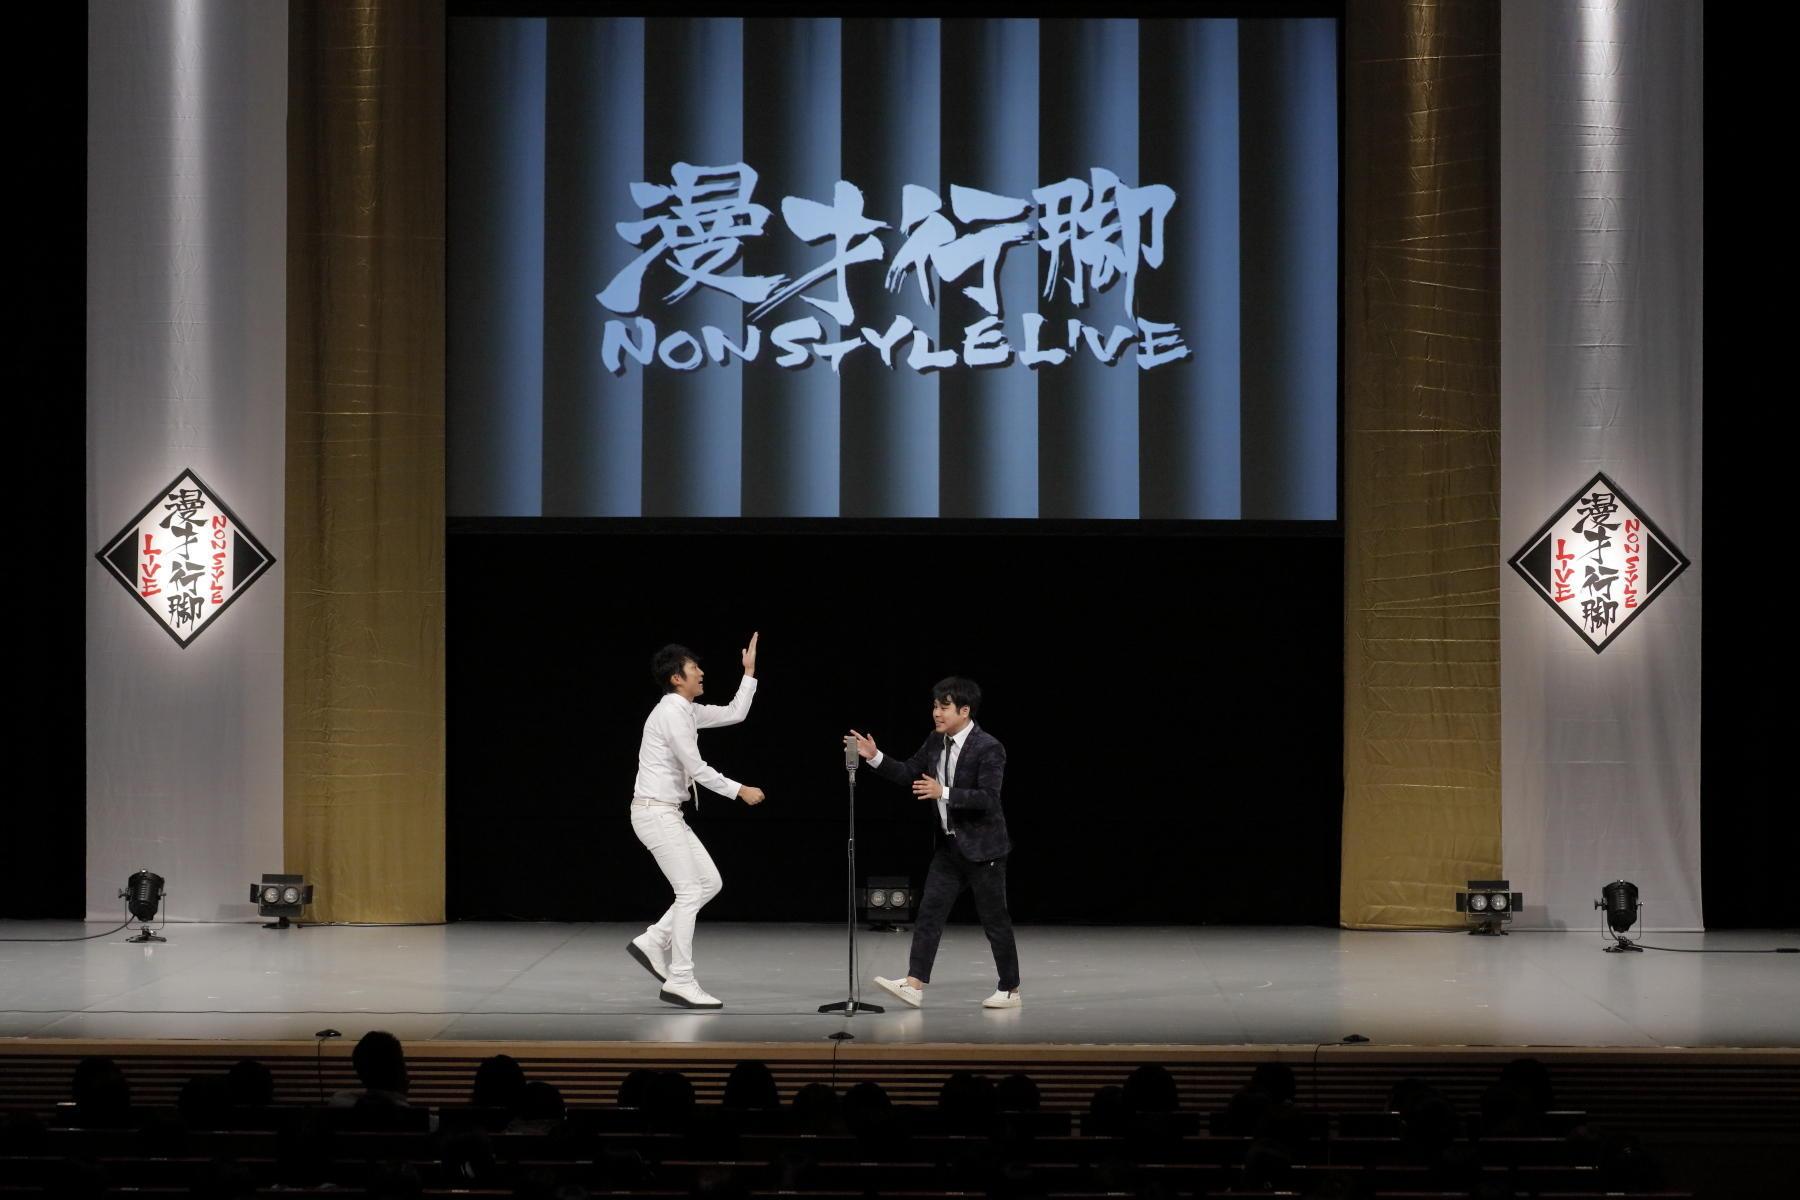 http://news.yoshimoto.co.jp/20171112125824-f55052a0e02cd8f5c1bc460c54cd00e52442c4b2.jpg